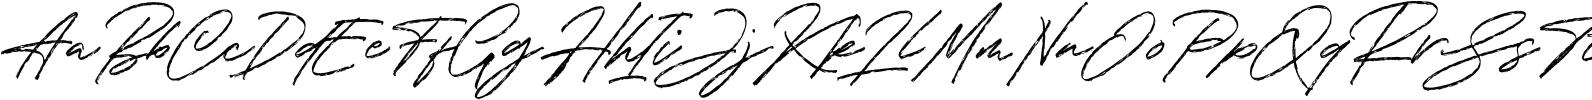 The Broadband - SVG Font